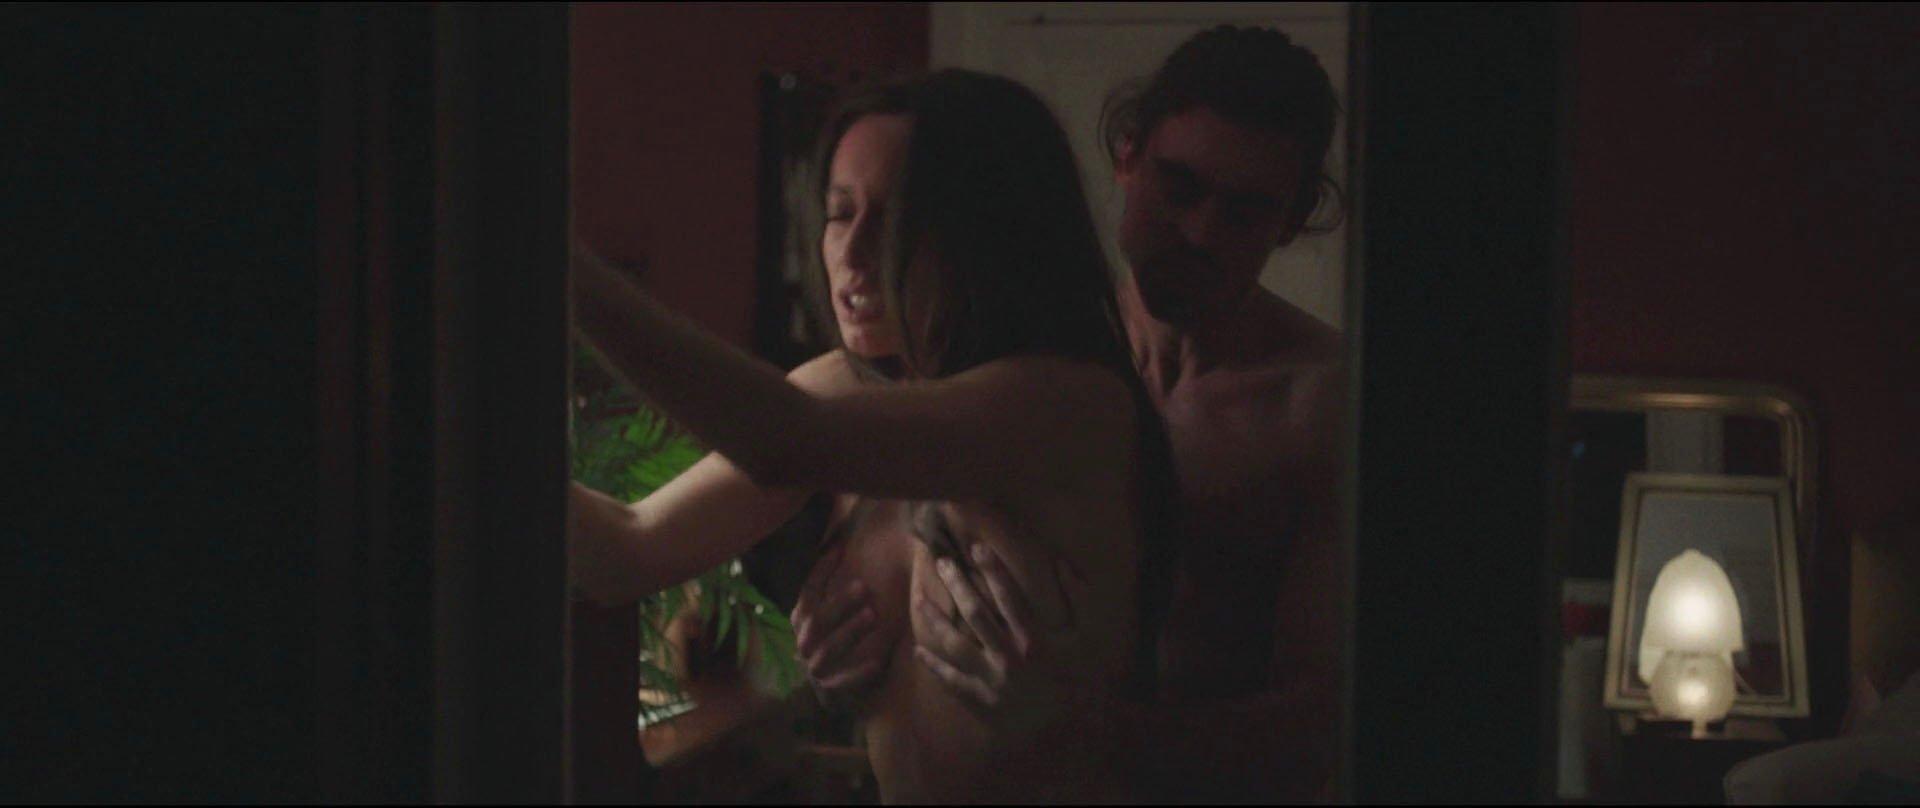 Oona chaplin sex scene